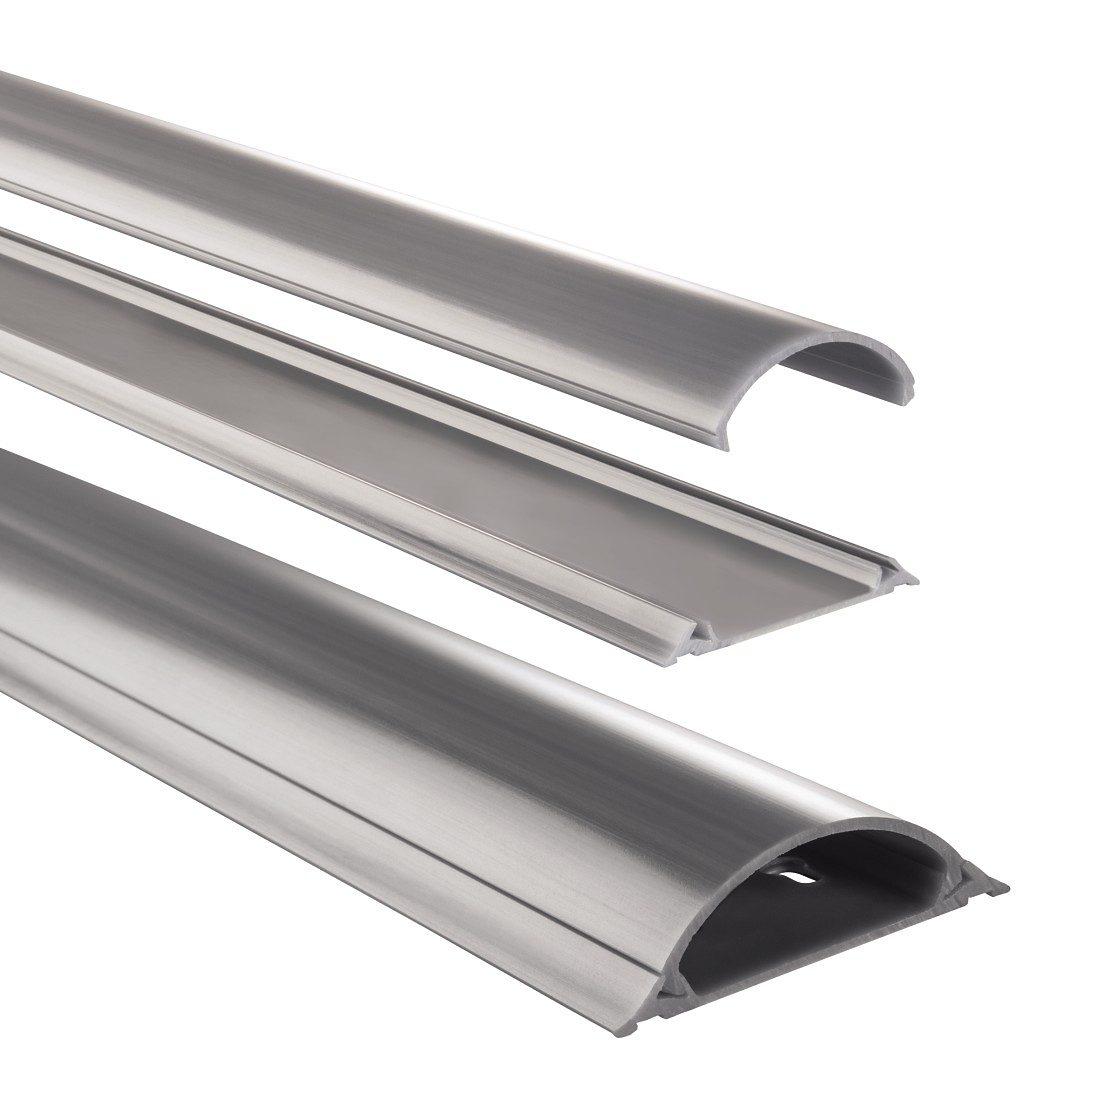 Hama PVC-Kabelkanal, halbrund, 100/7/2,1 cm, Grau